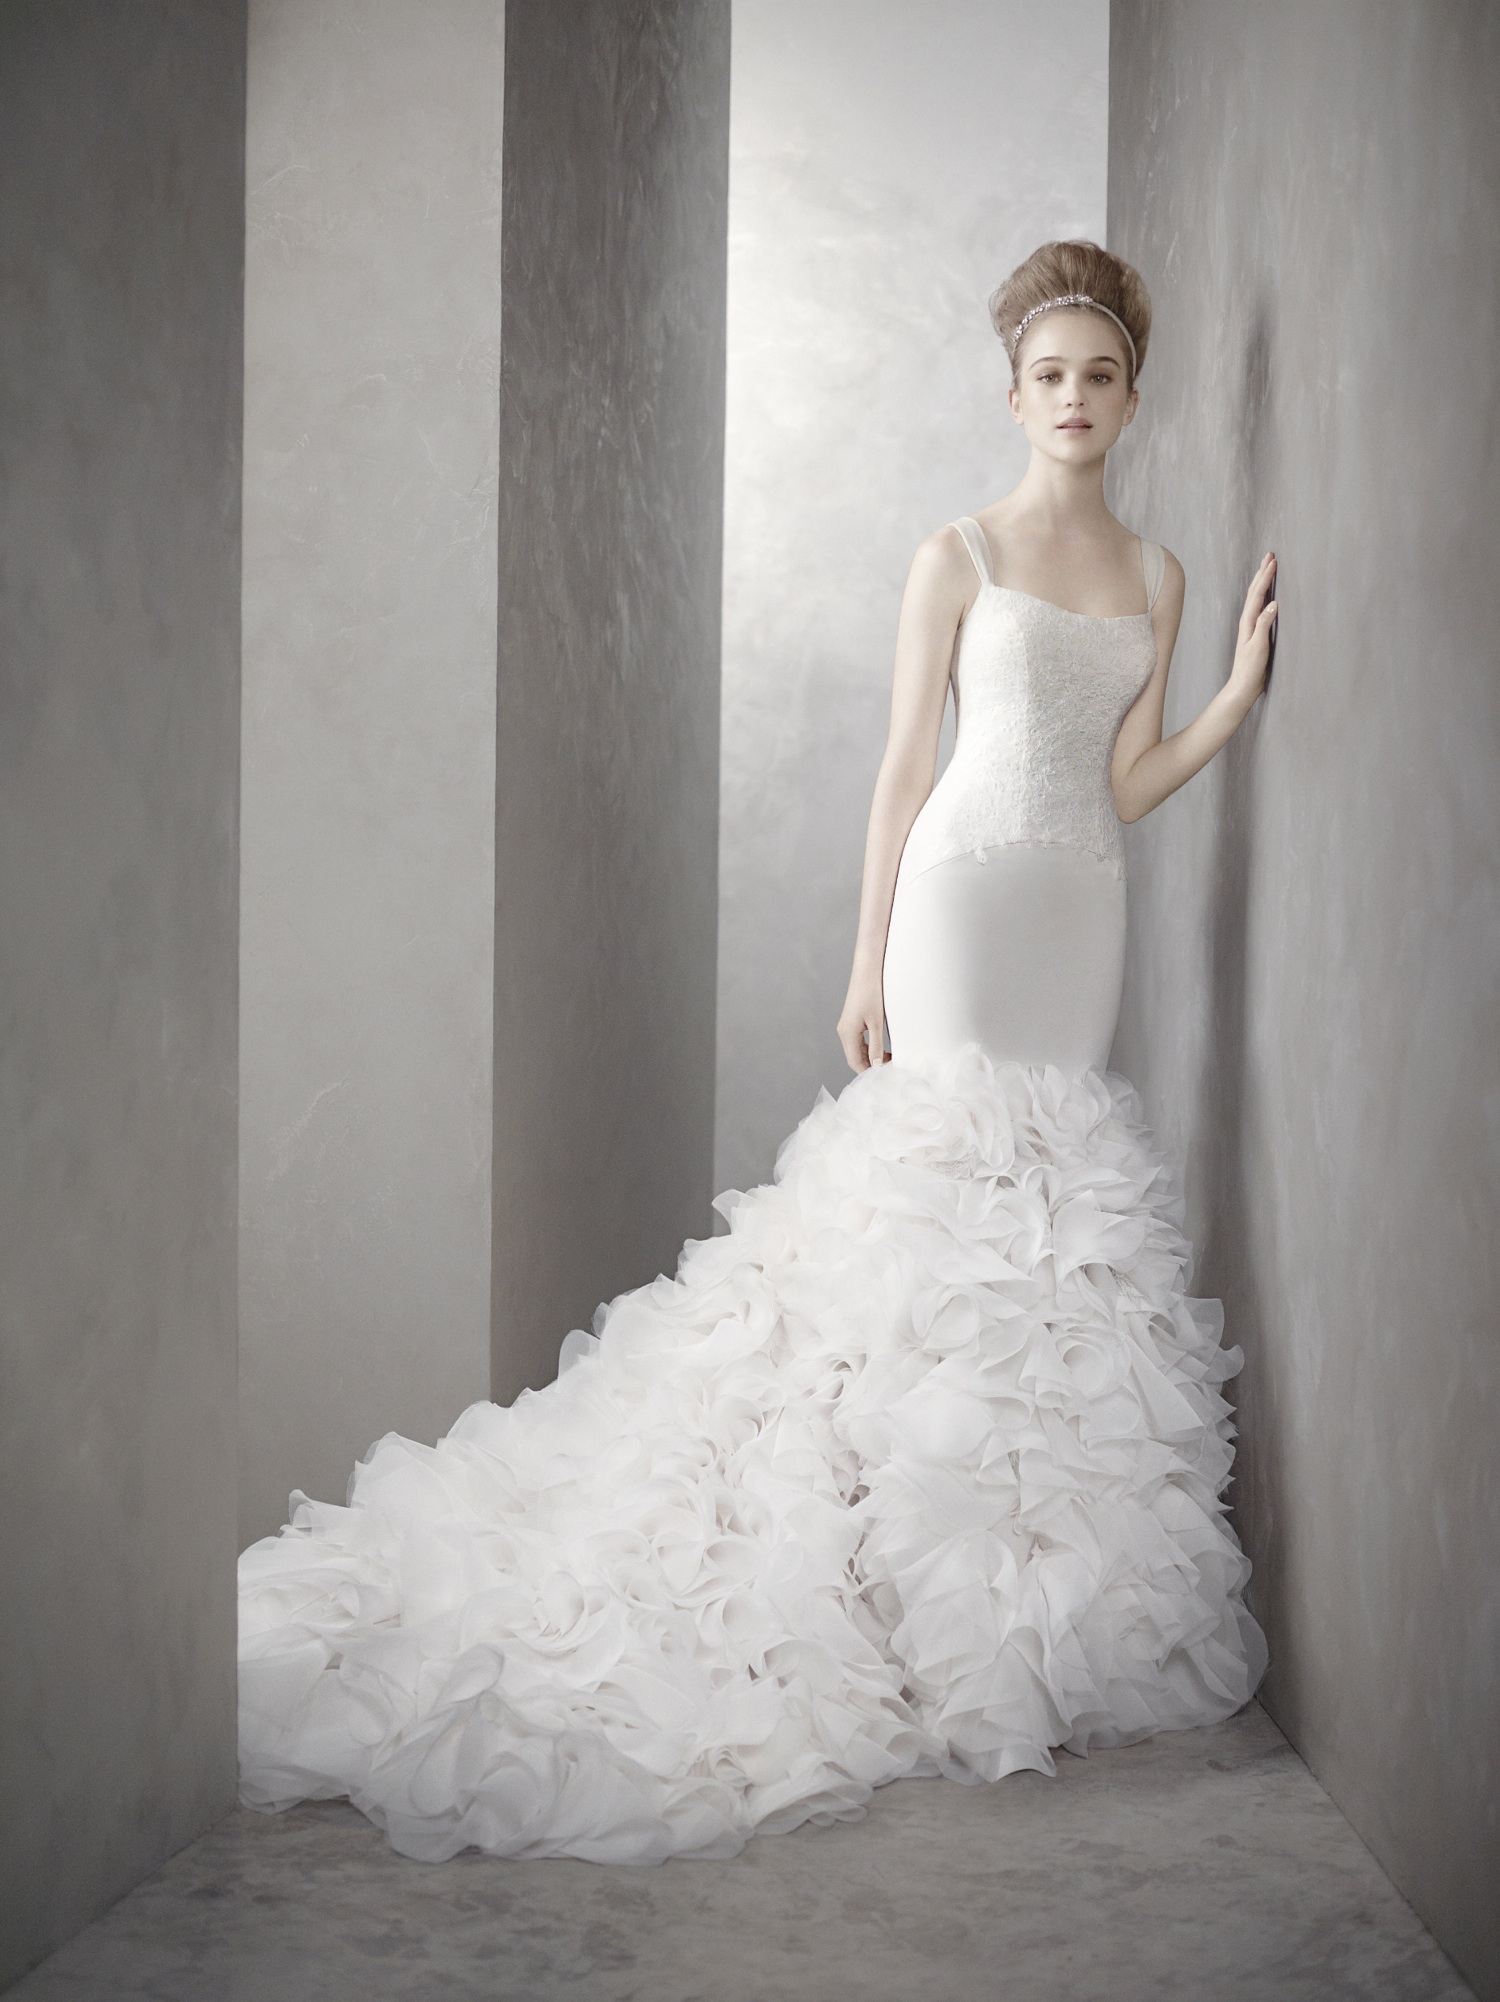 Kim kardashian bridesmaid dresses best ideas dress kim kardashian bridesmaid dresses hd image ombrellifo Image collections